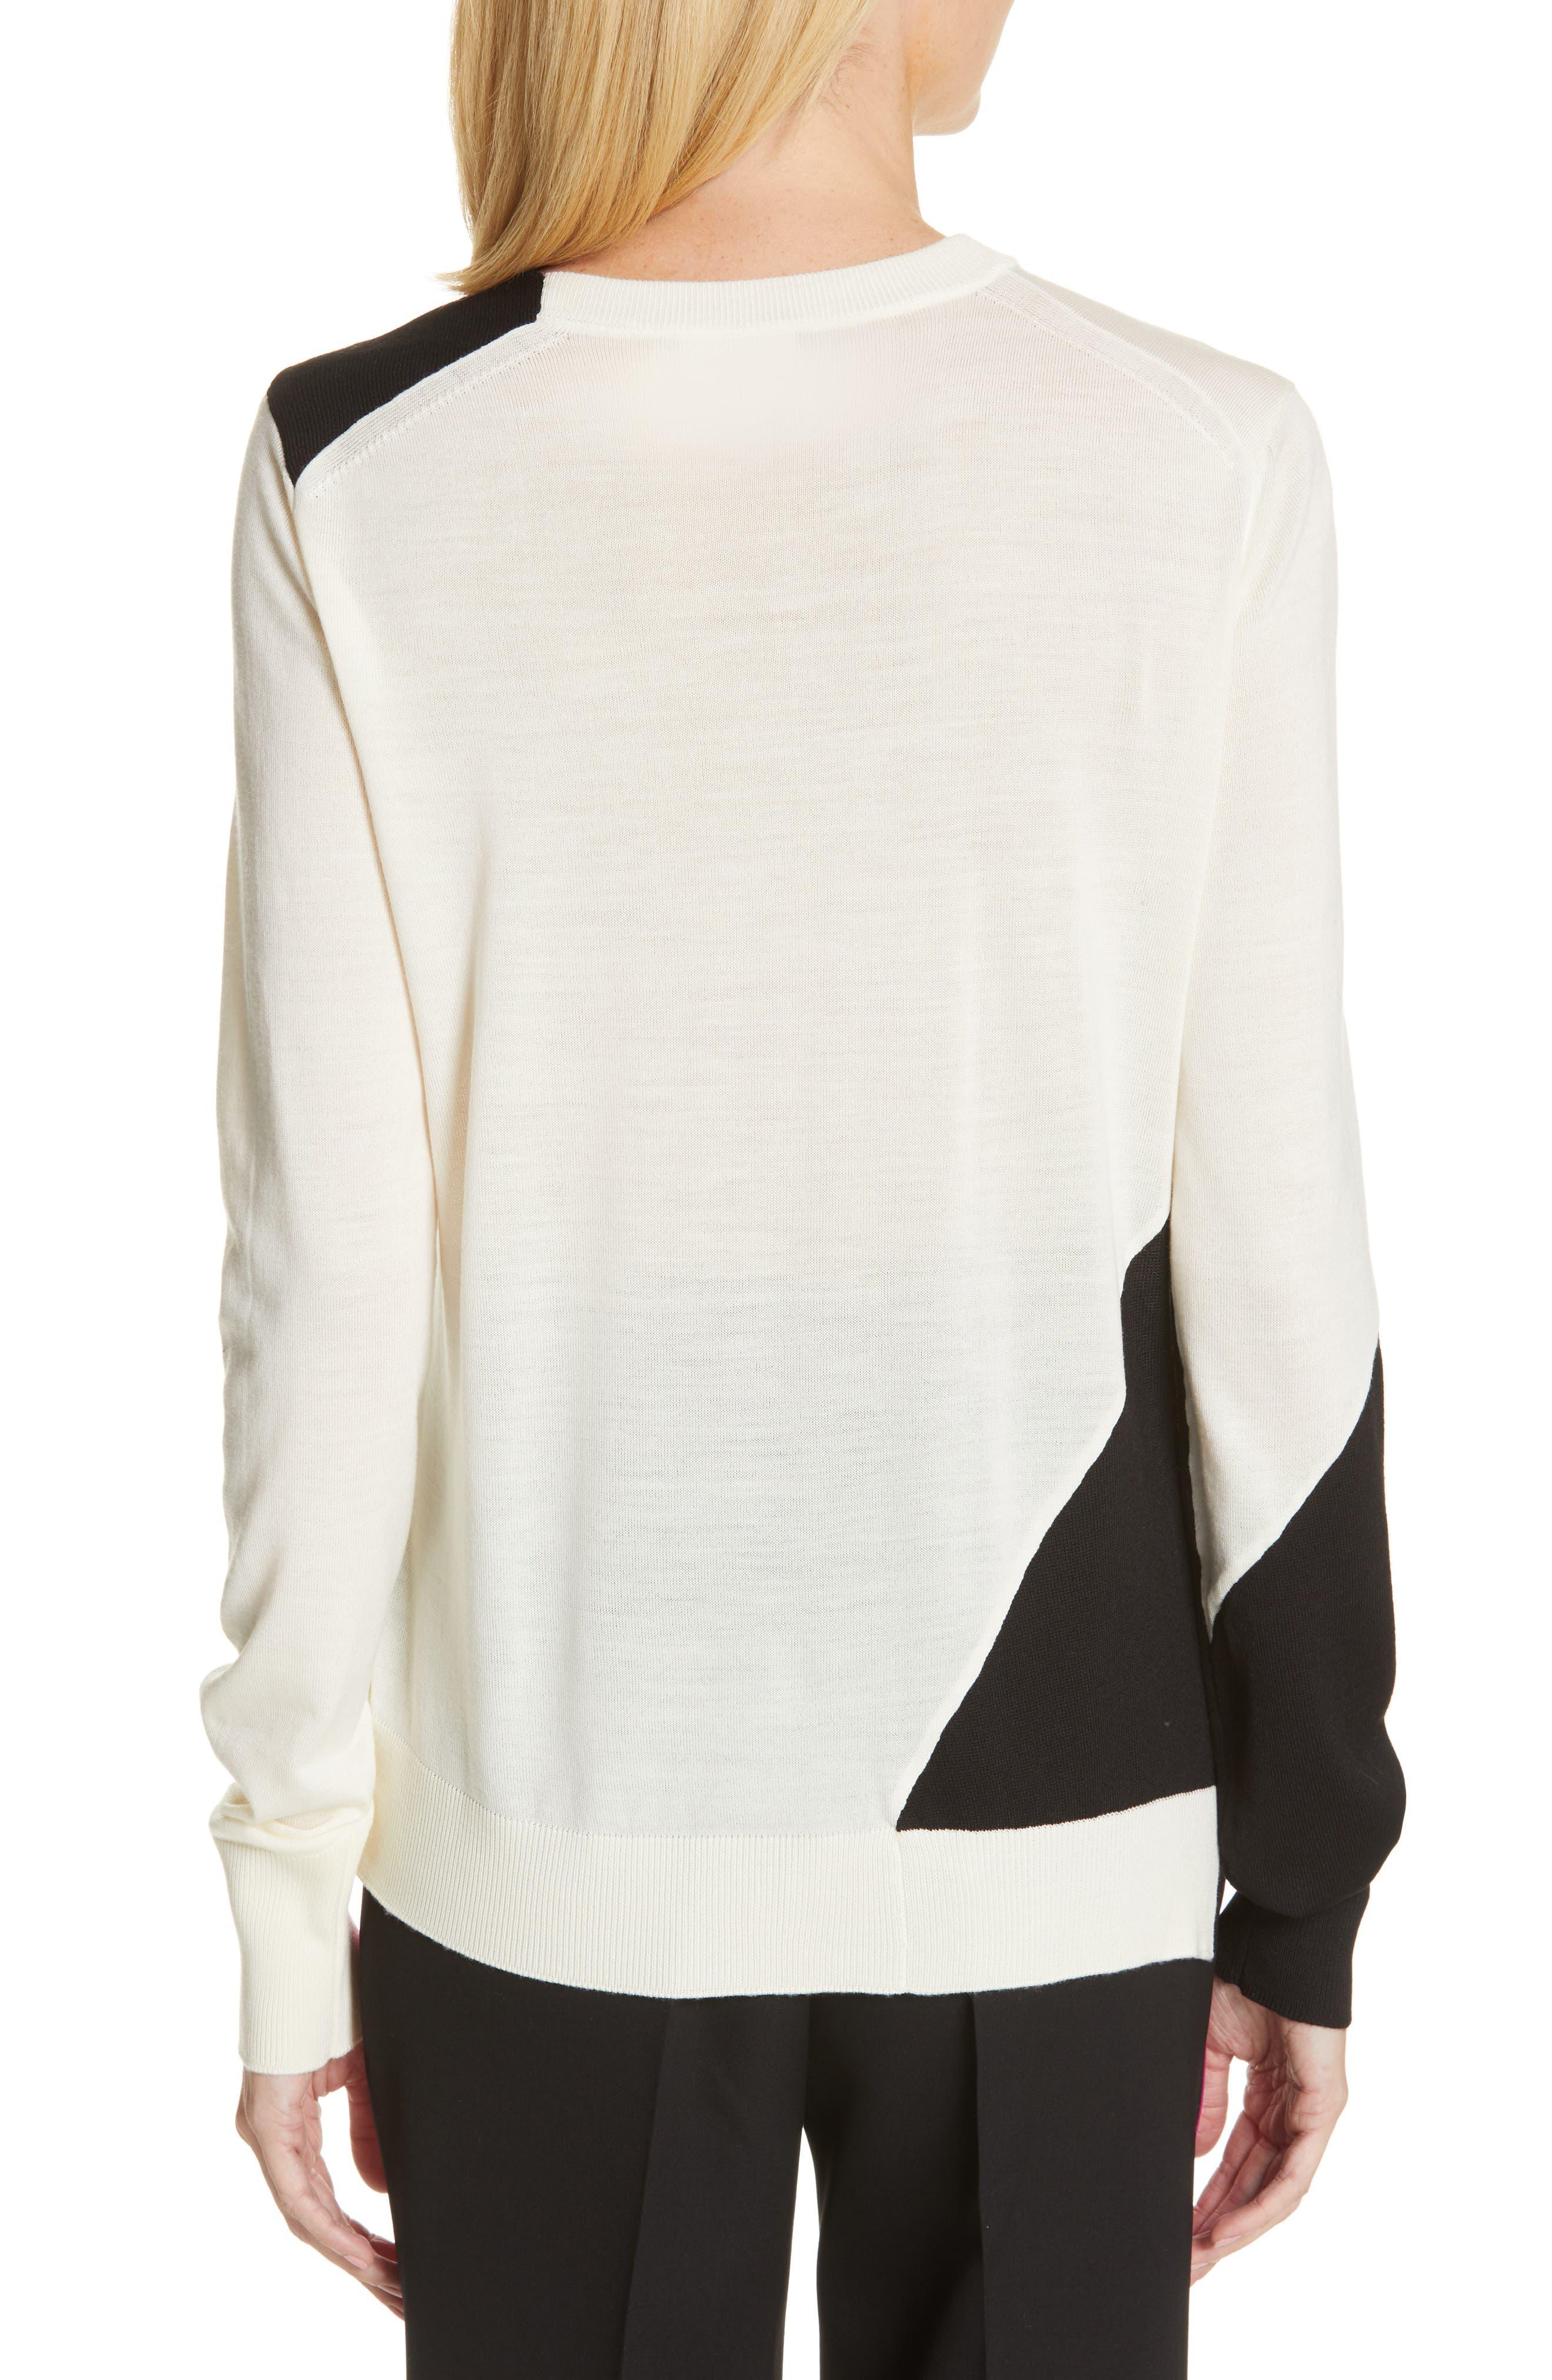 CALVIN KLEIN 205W39NYC, Contrast Stripe Wool Blend Sweater, Alternate thumbnail 2, color, WHITE BLACK TOURNESOL